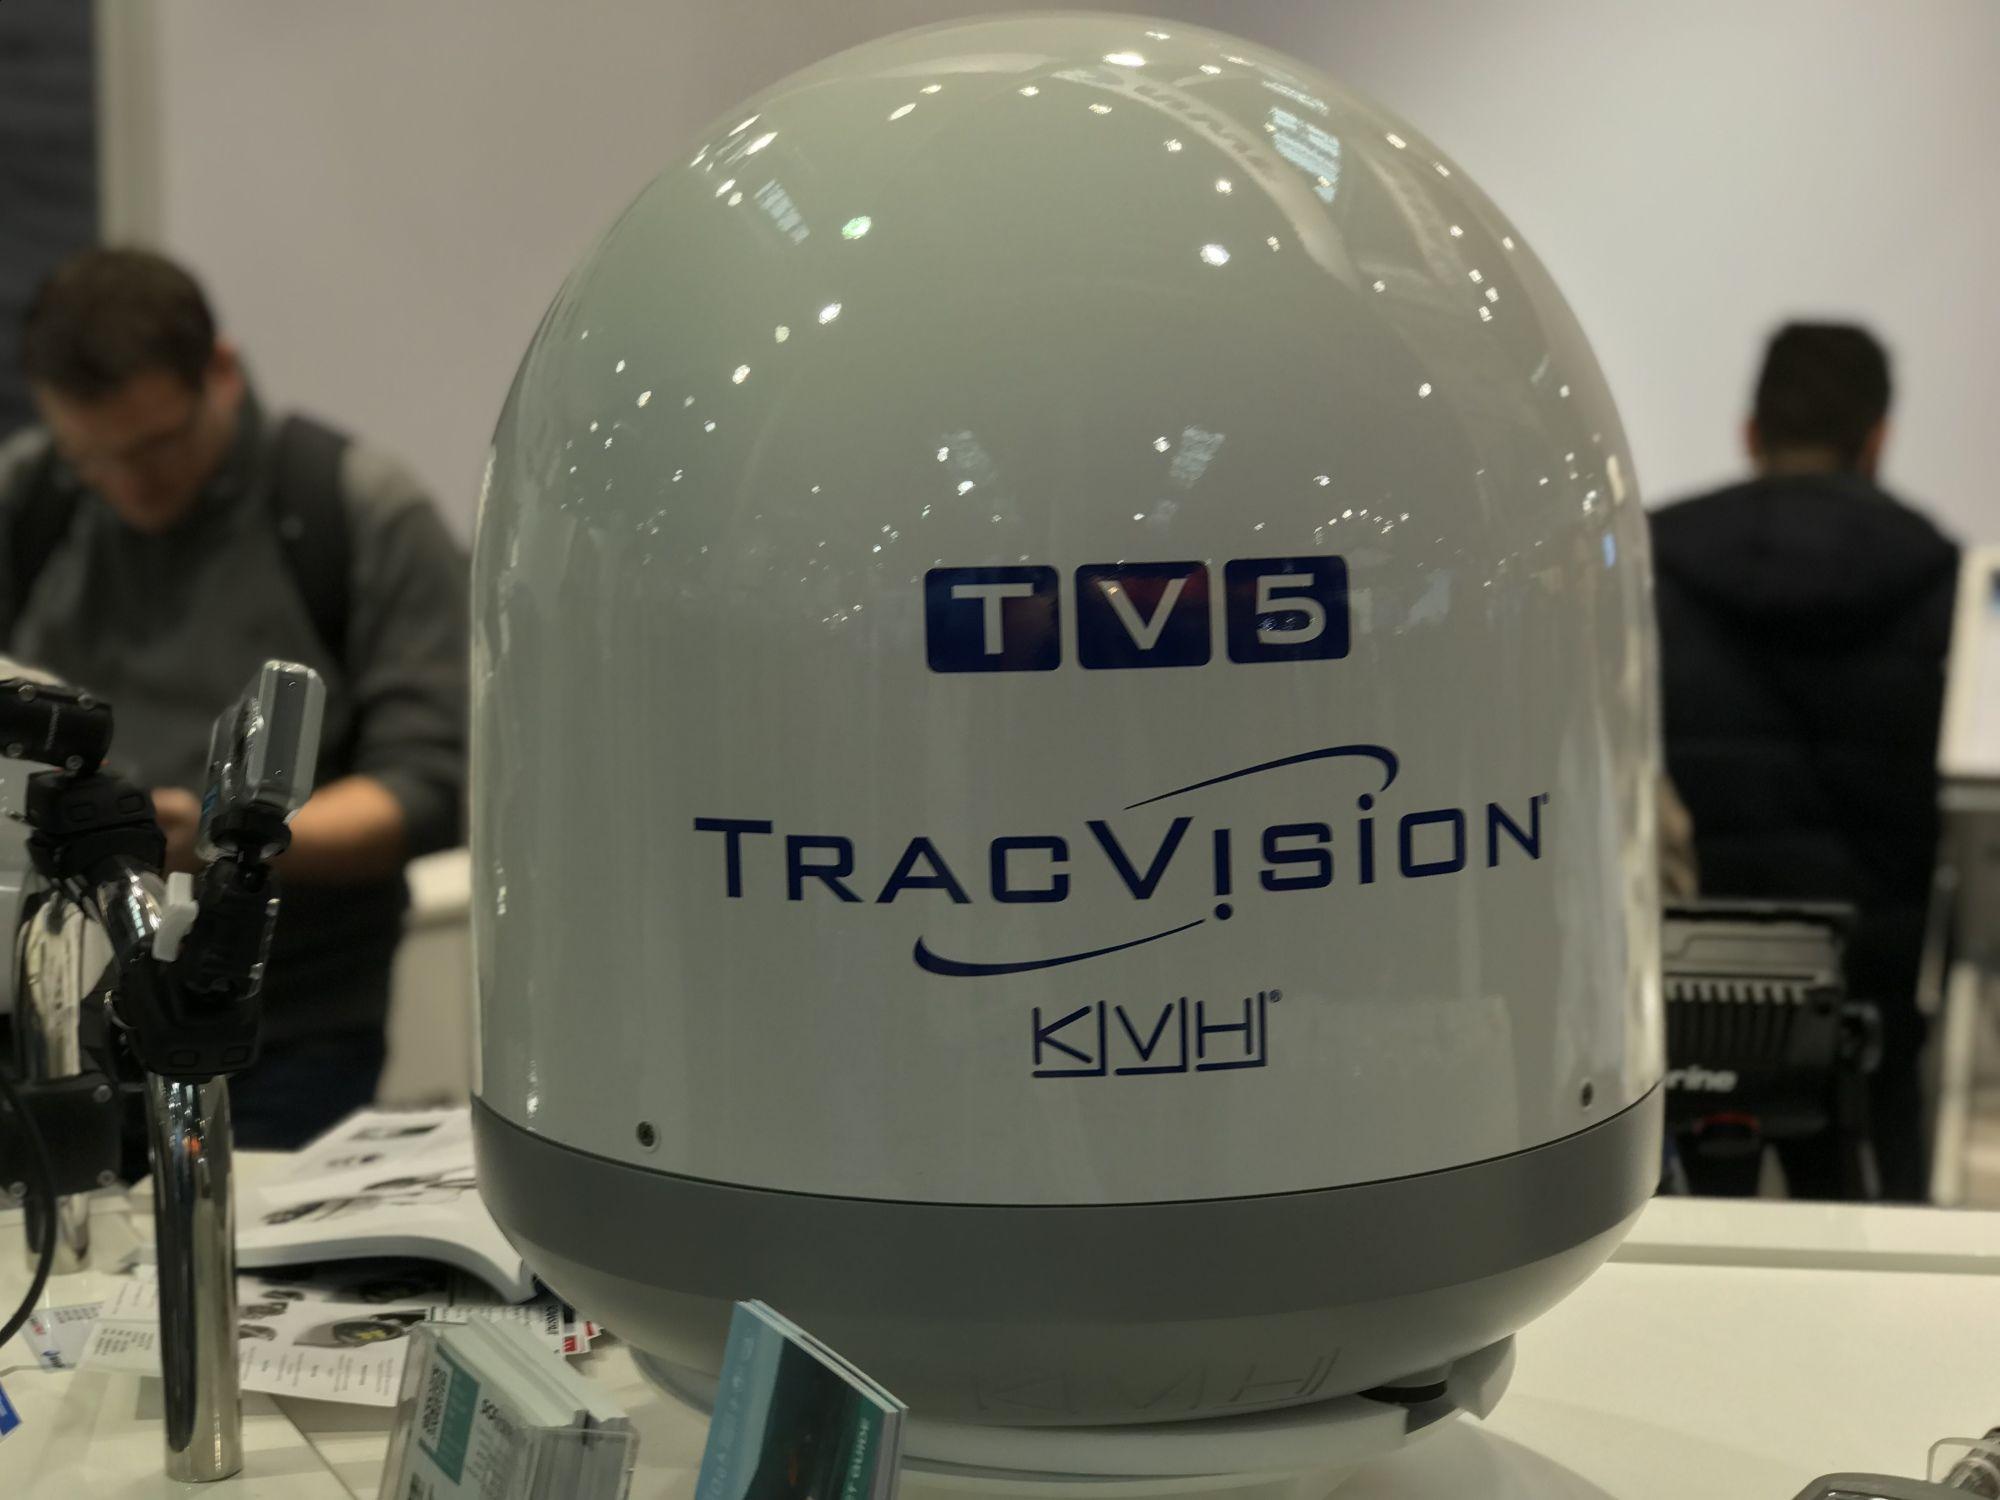 KVH TracVision TV5 mit IP-TV-Hub B & autom. Skew-Einstellung